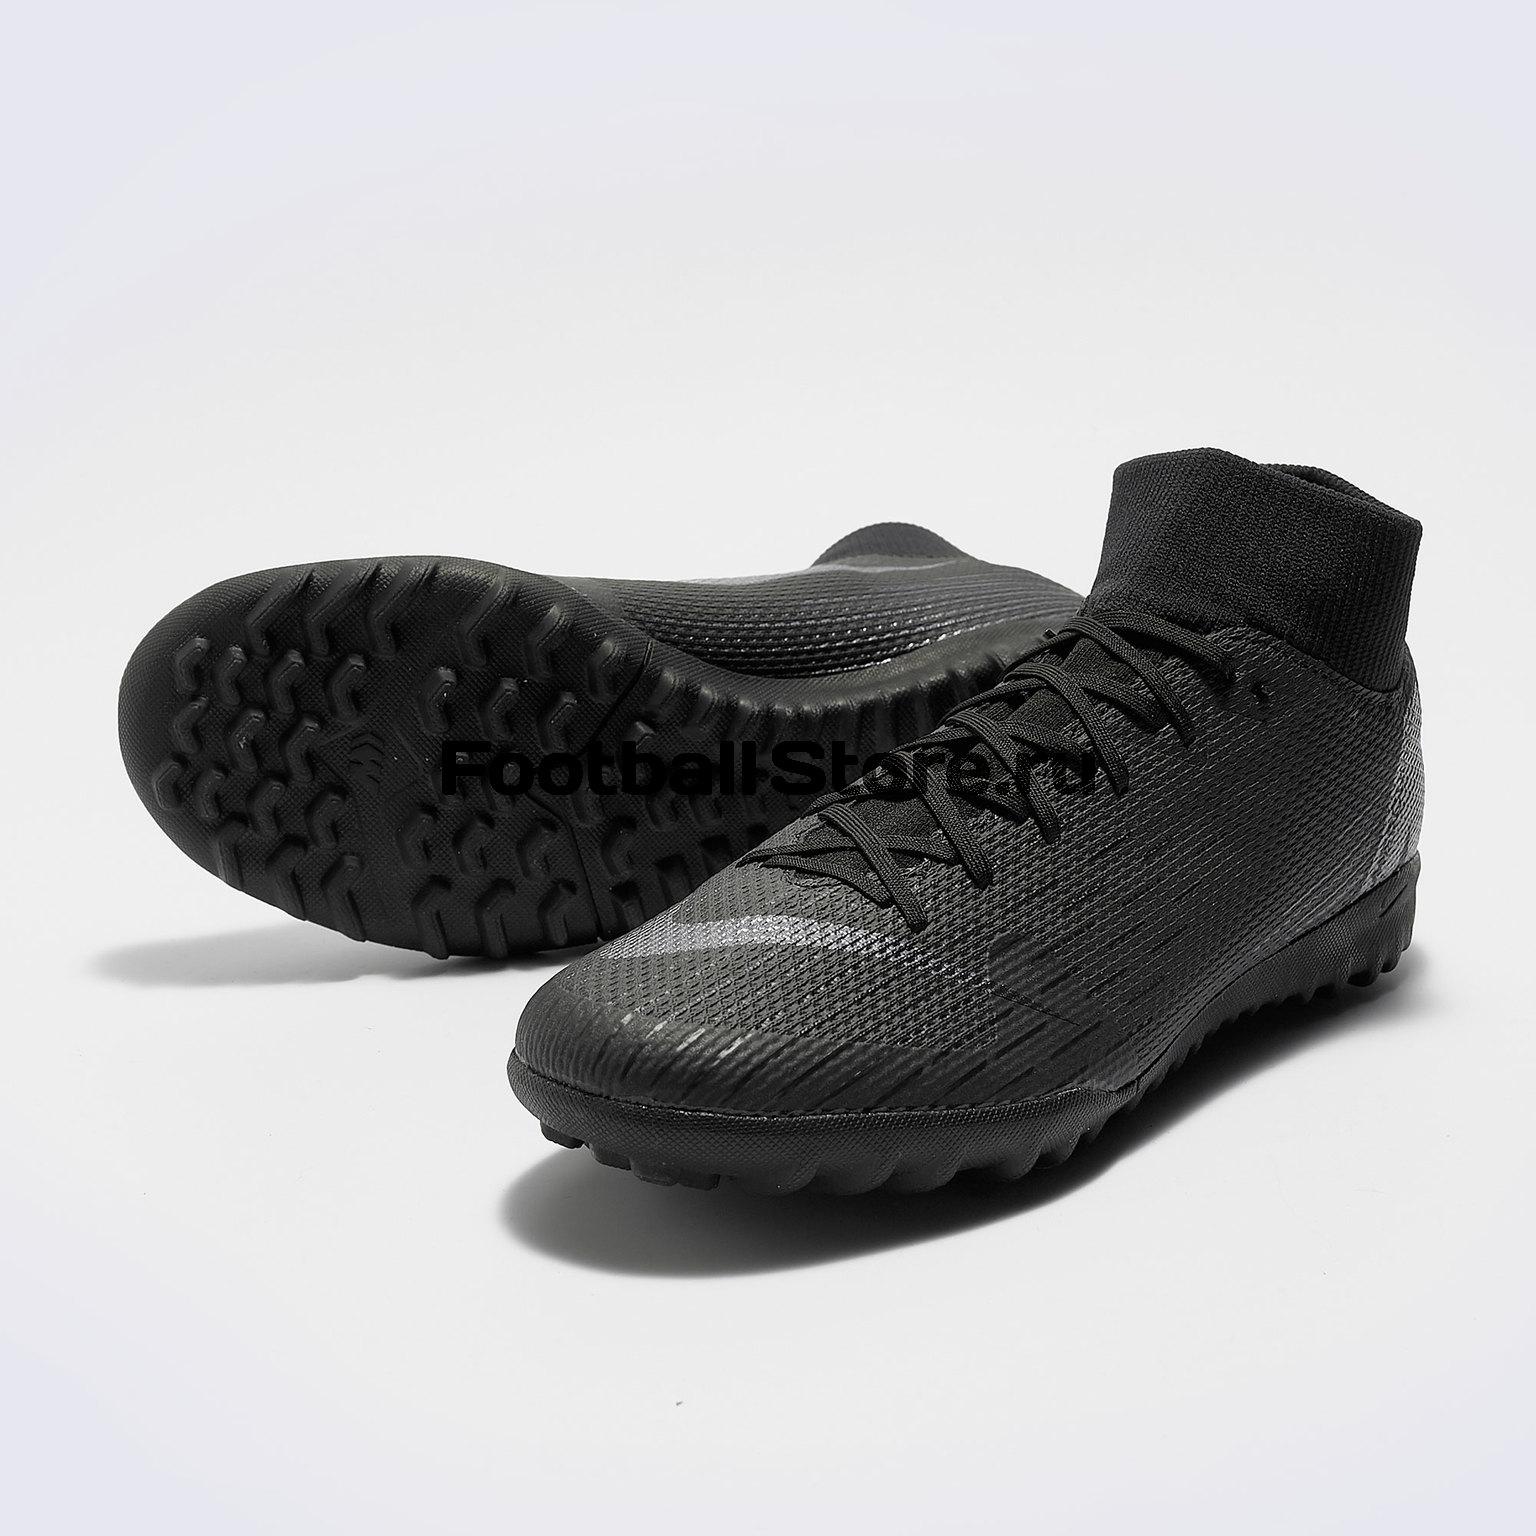 цена Шиповки Nike SuperFly 6 Academy TF AH7370-001 онлайн в 2017 году